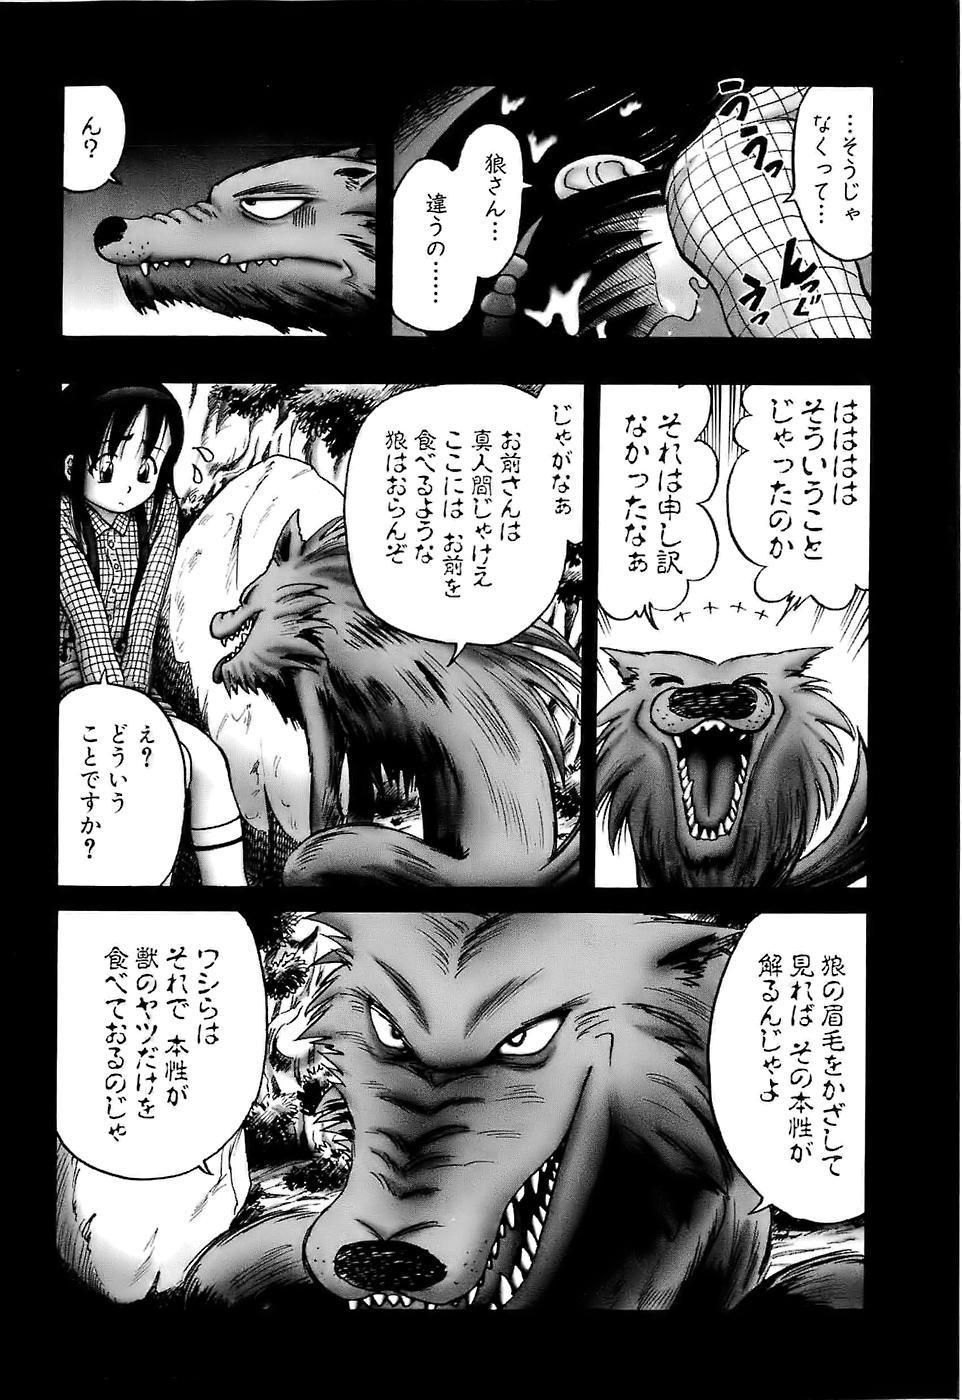 [Bow Rei] Osanai Kajitsu -Inkou Shougakusei no Houkago- Jou 143